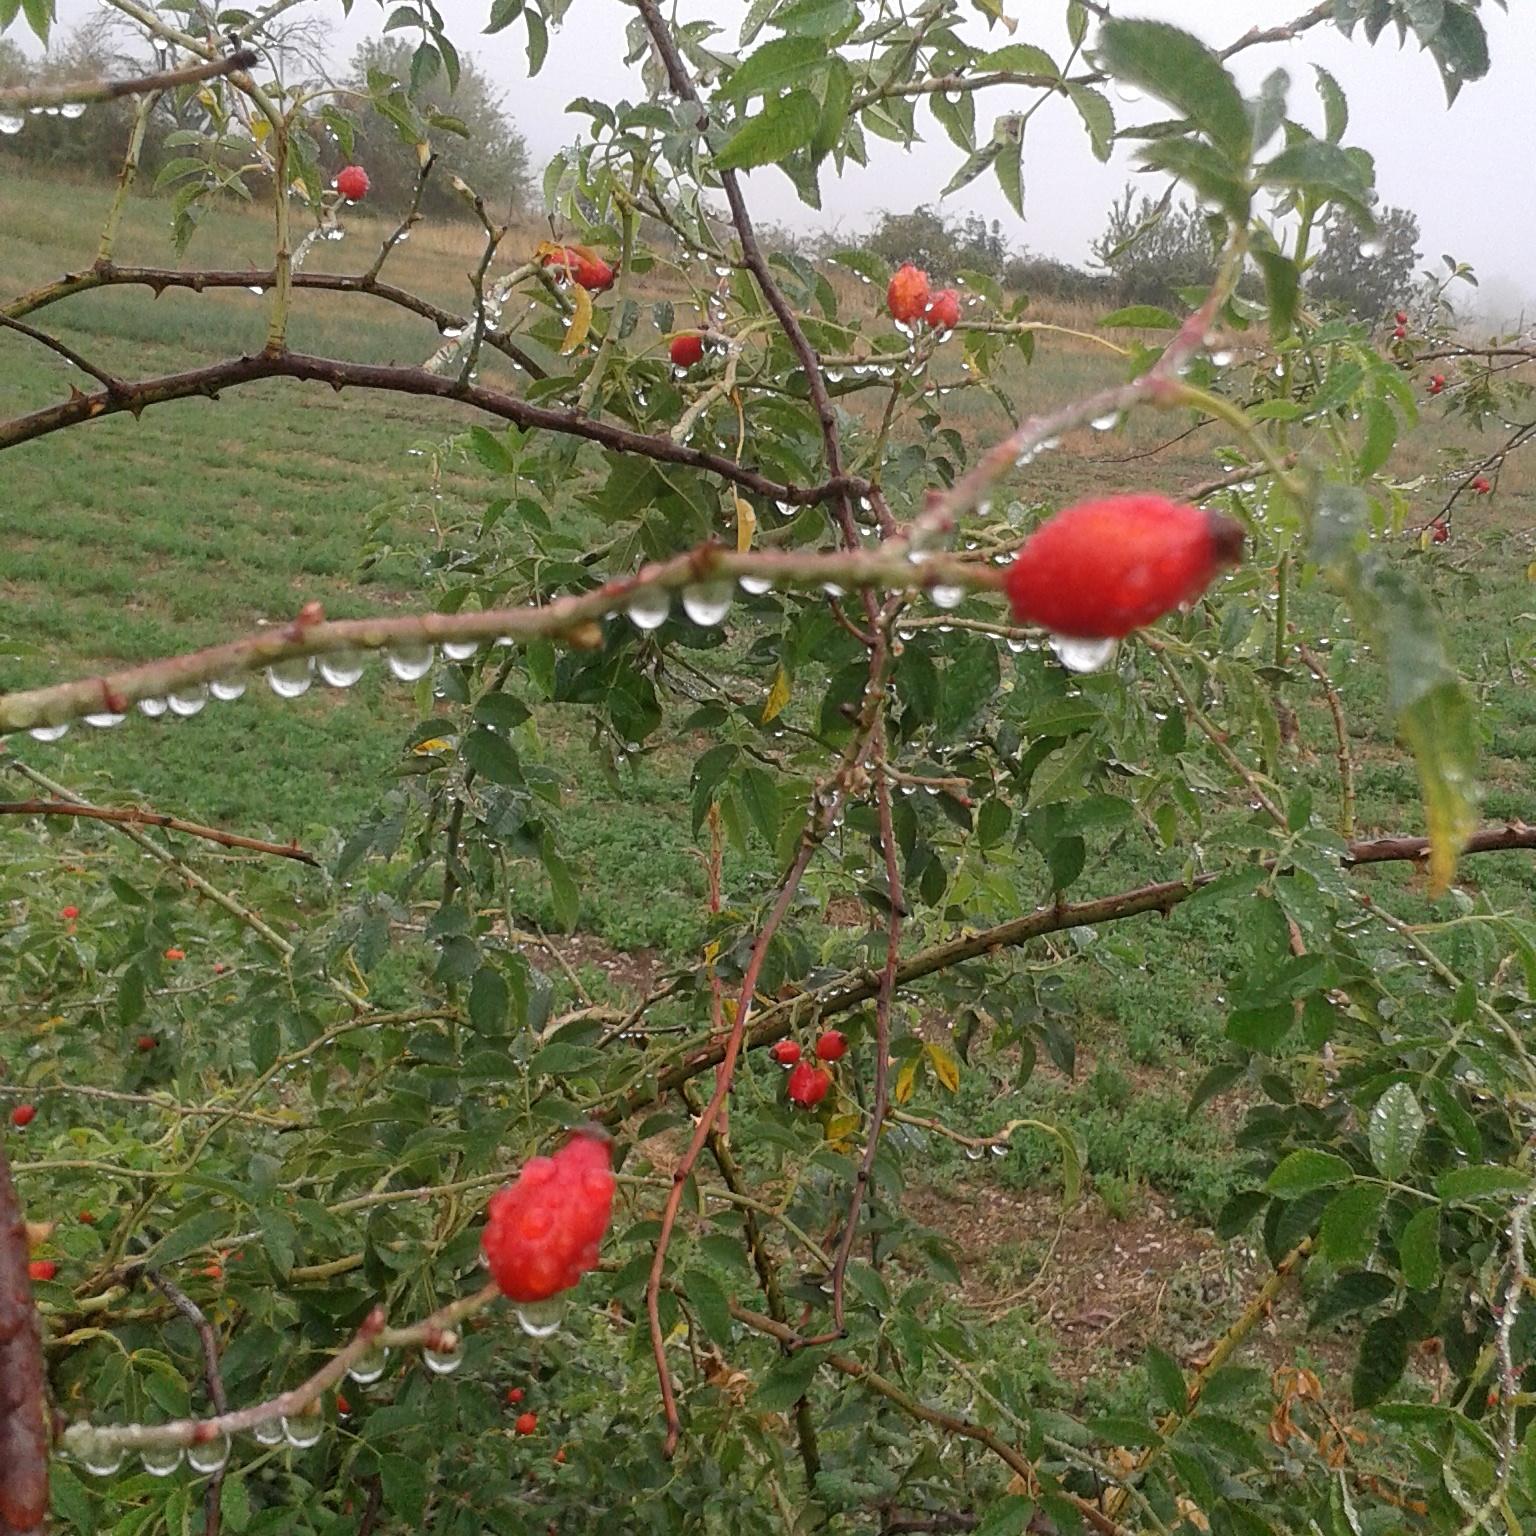 i campi di mais: marmellata di bacche di rosa canina